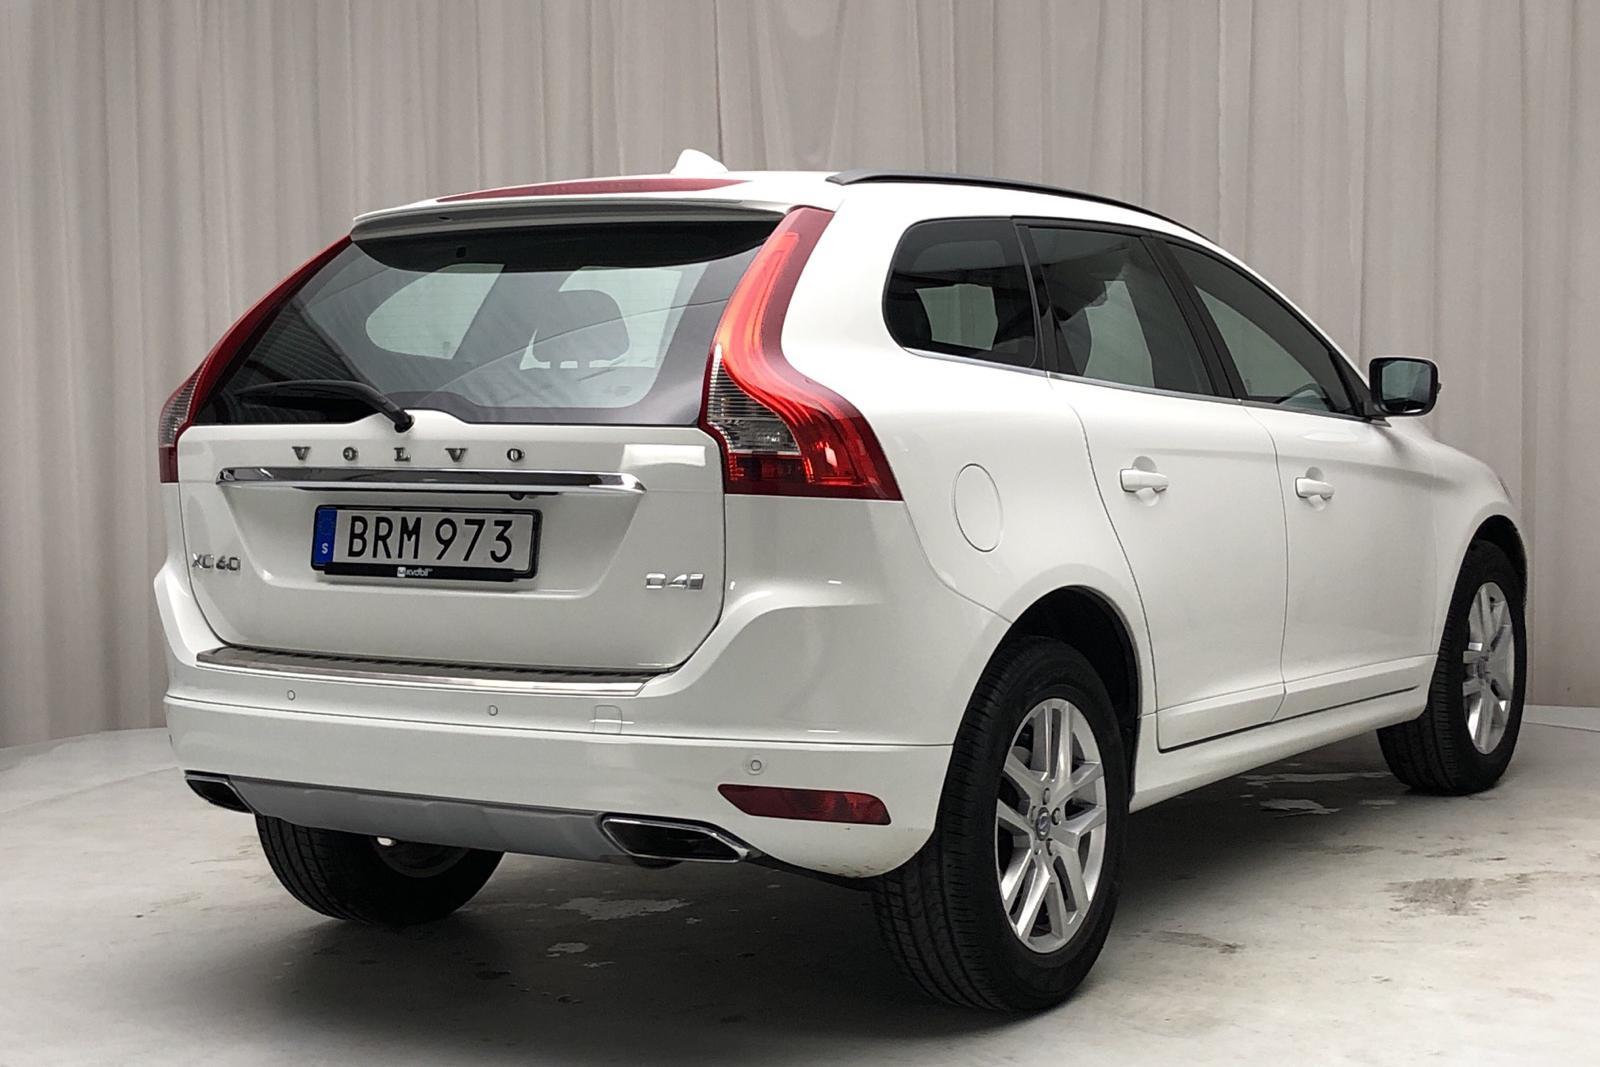 Volvo XC60 D4 2WD (190hk) - 0 km - Automatic - white - 2017